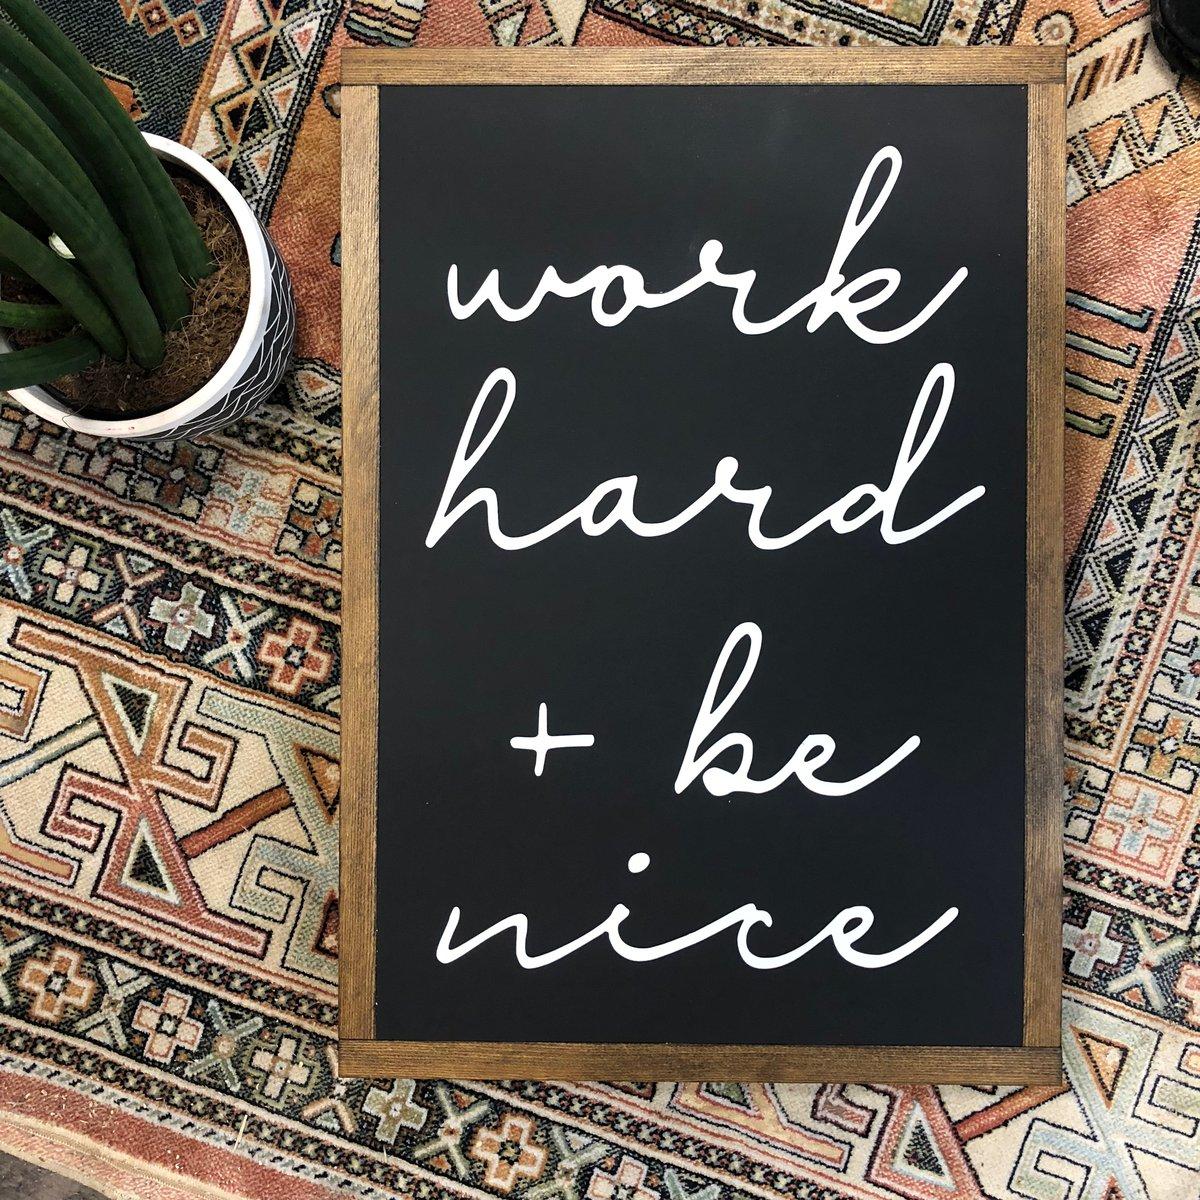 Image of Work Hard and Play Nice